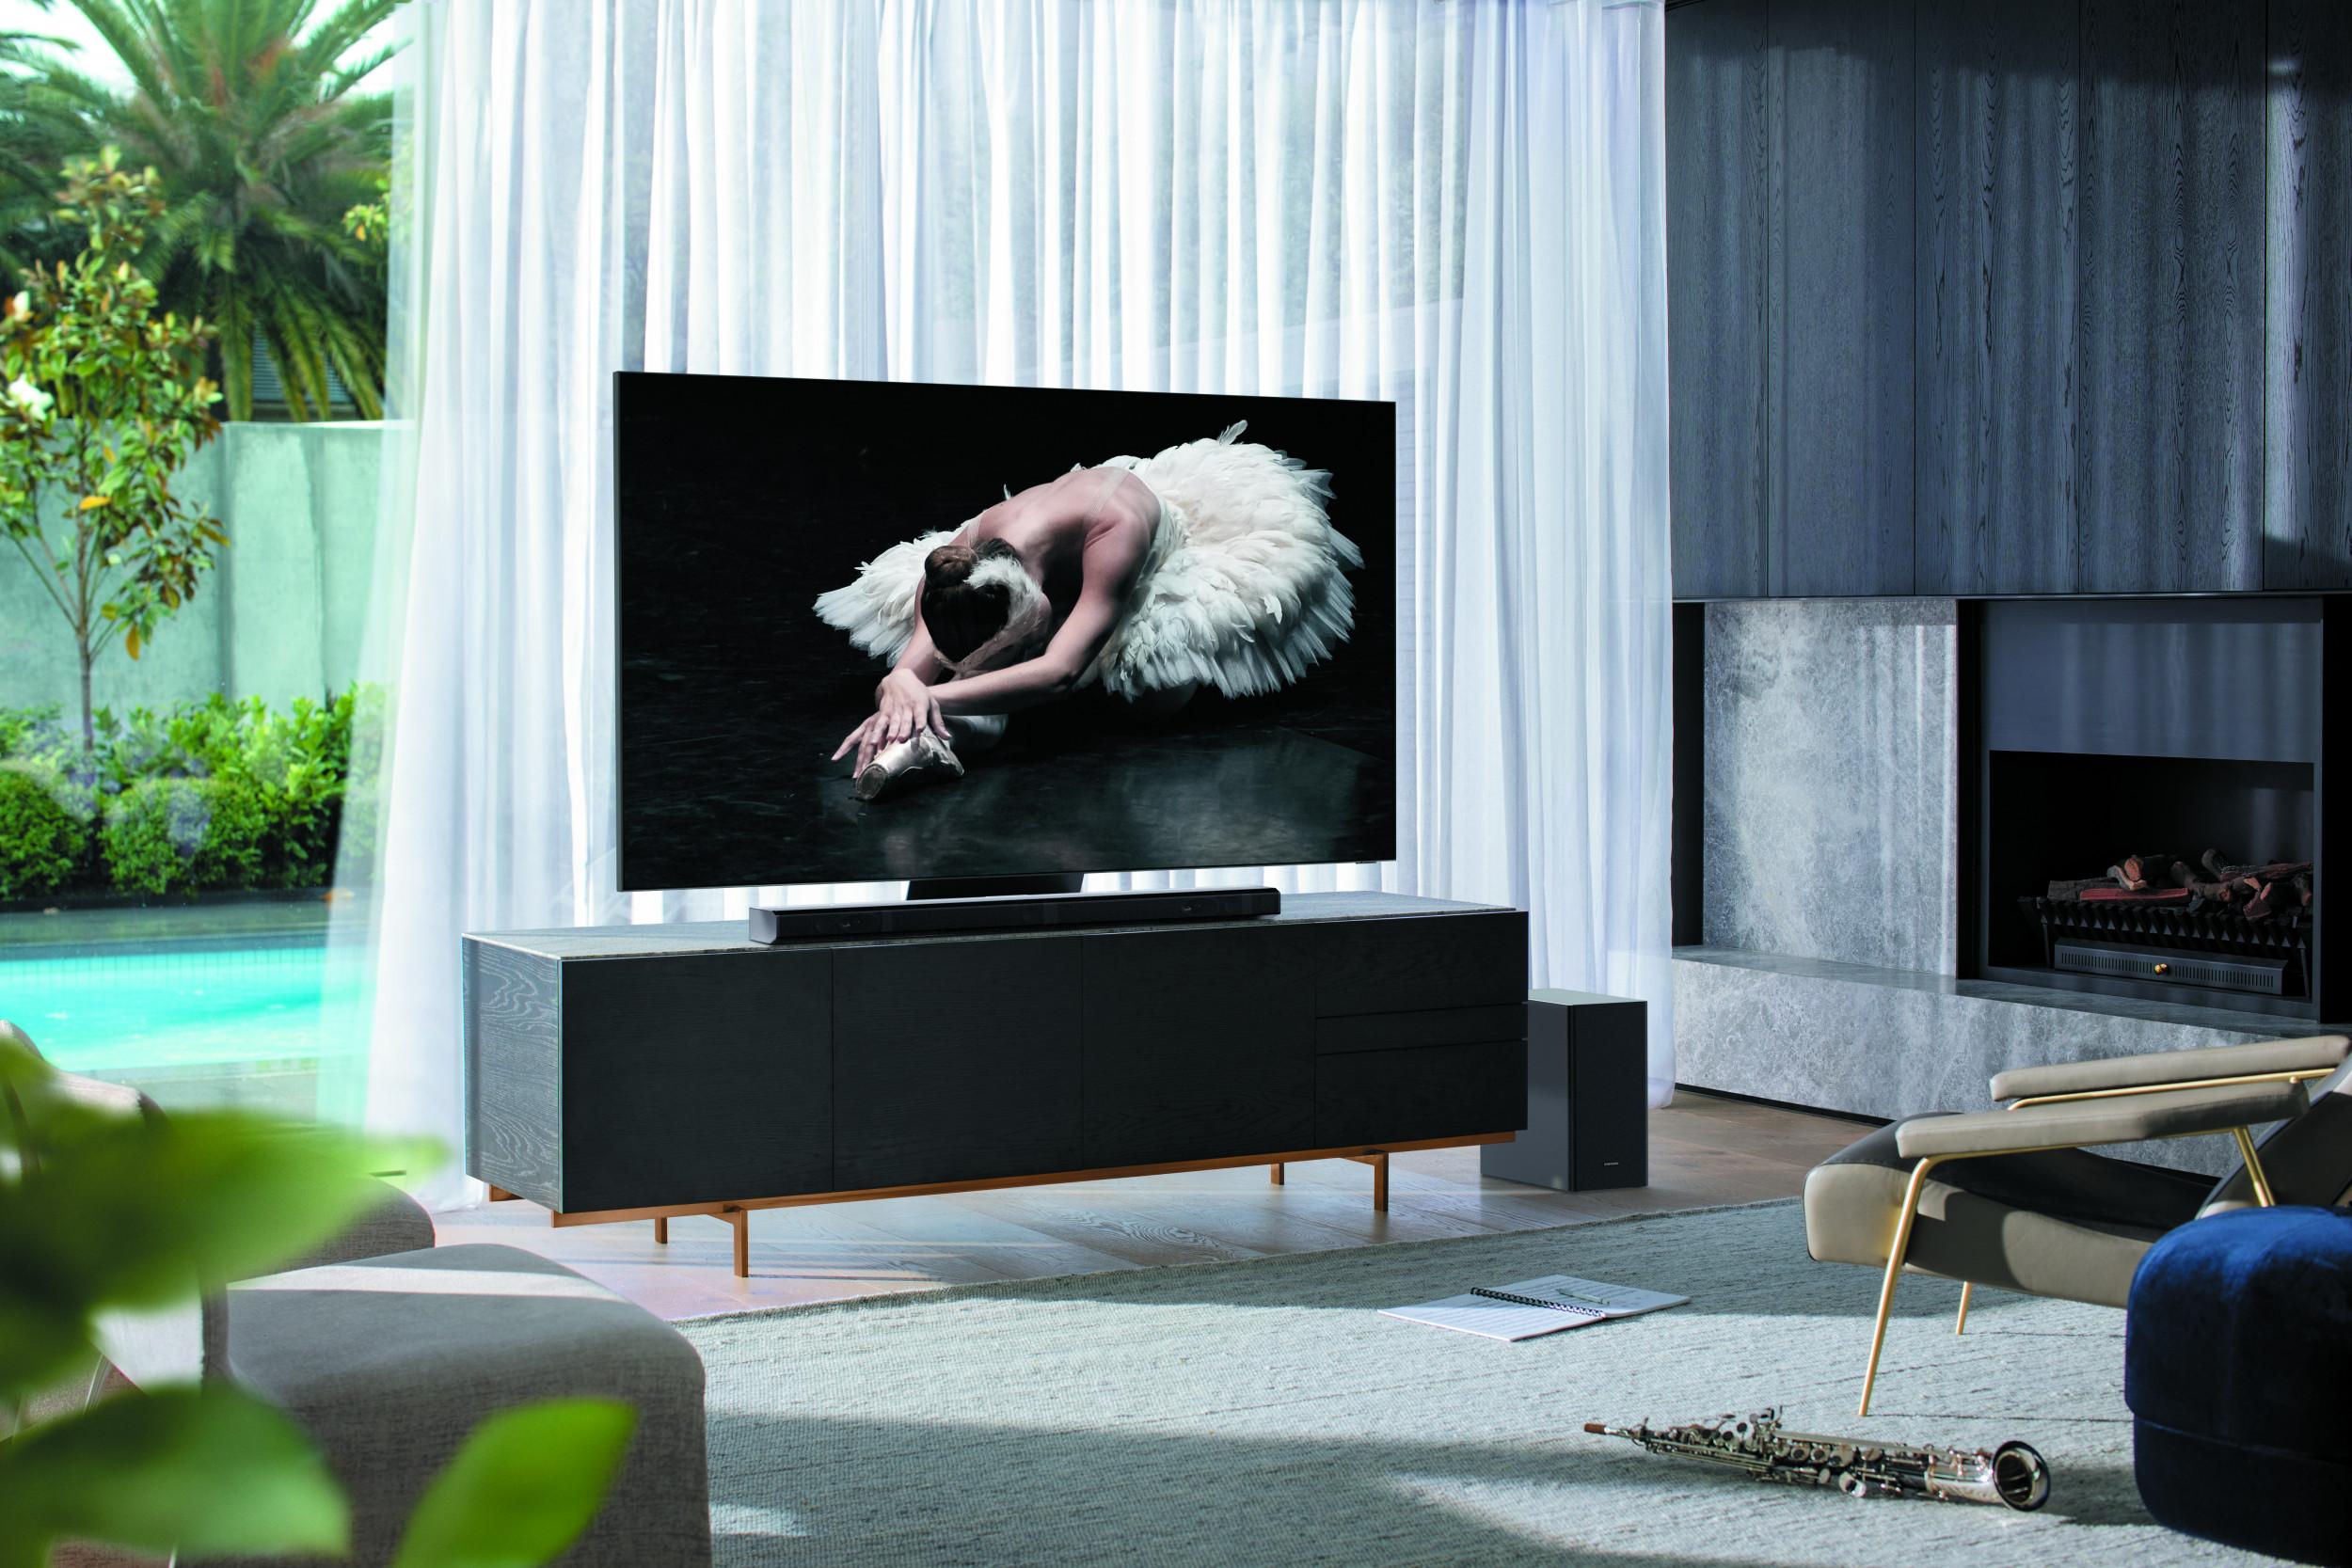 Best TV & Audio Gifts - Soundbar